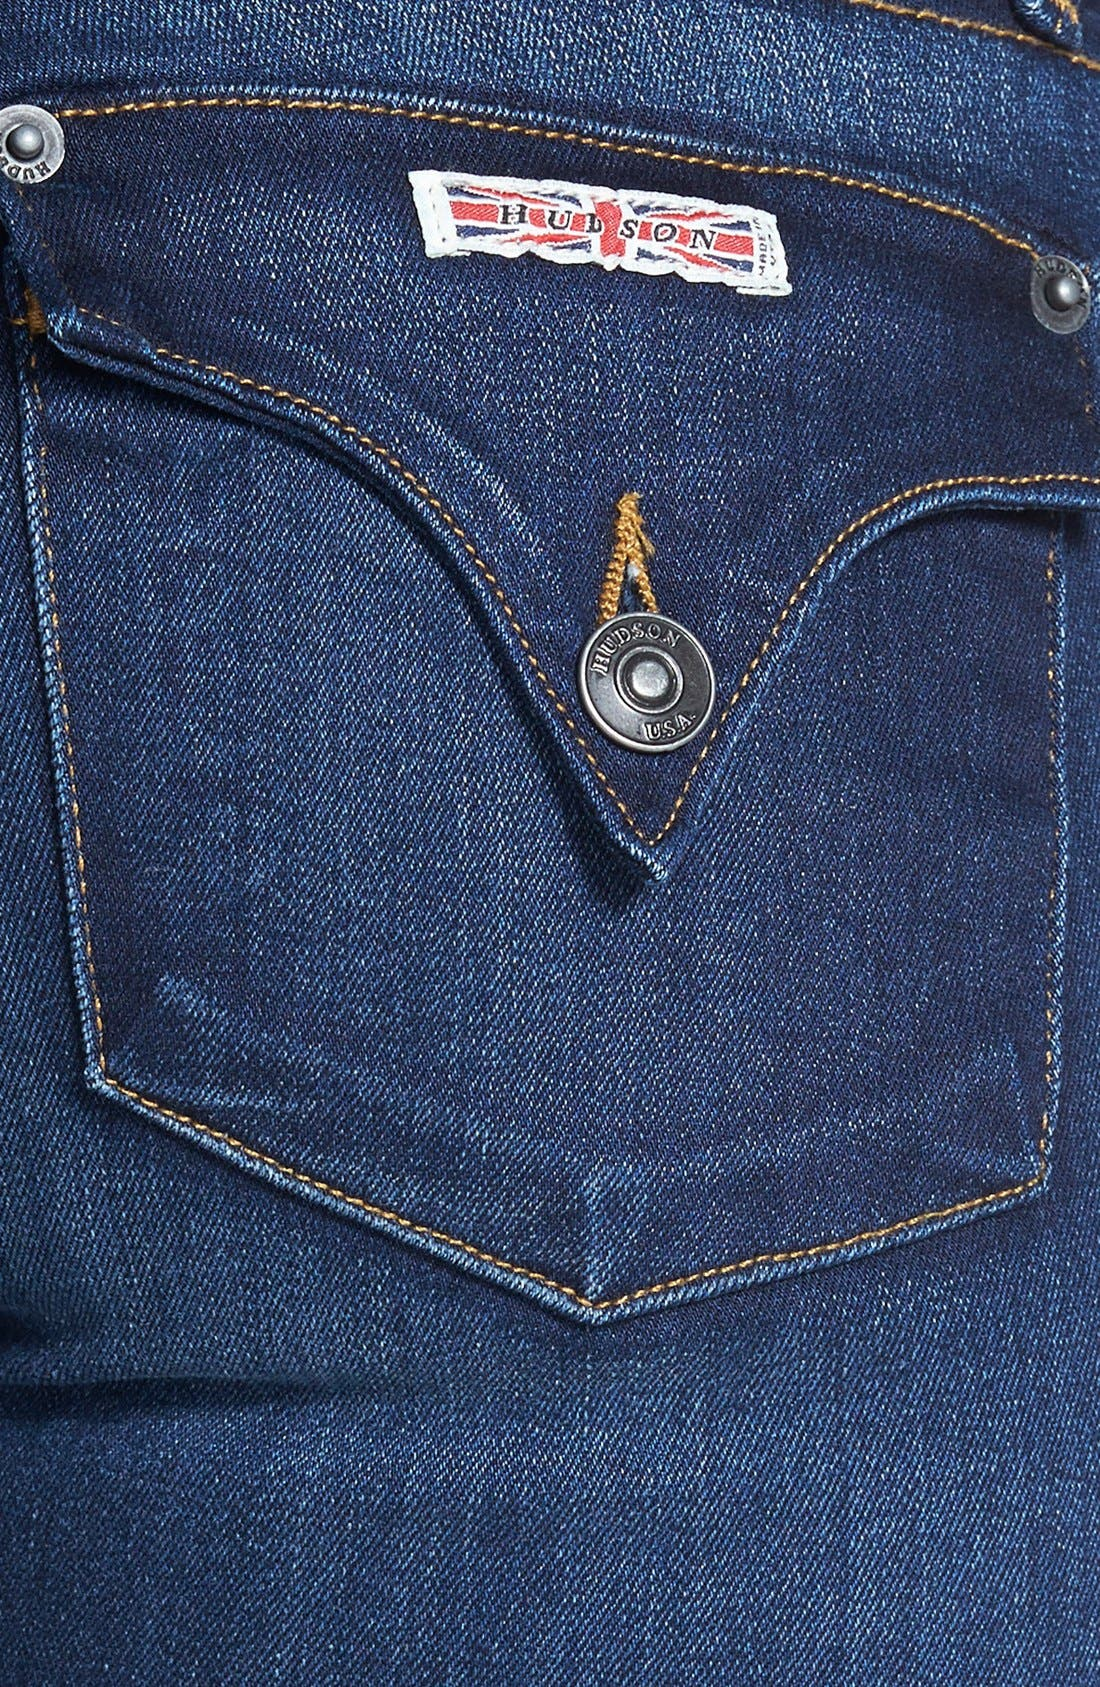 HUDSON JEANS, 'Collin' Supermodel Skinny Jeans, Alternate thumbnail 2, color, 423